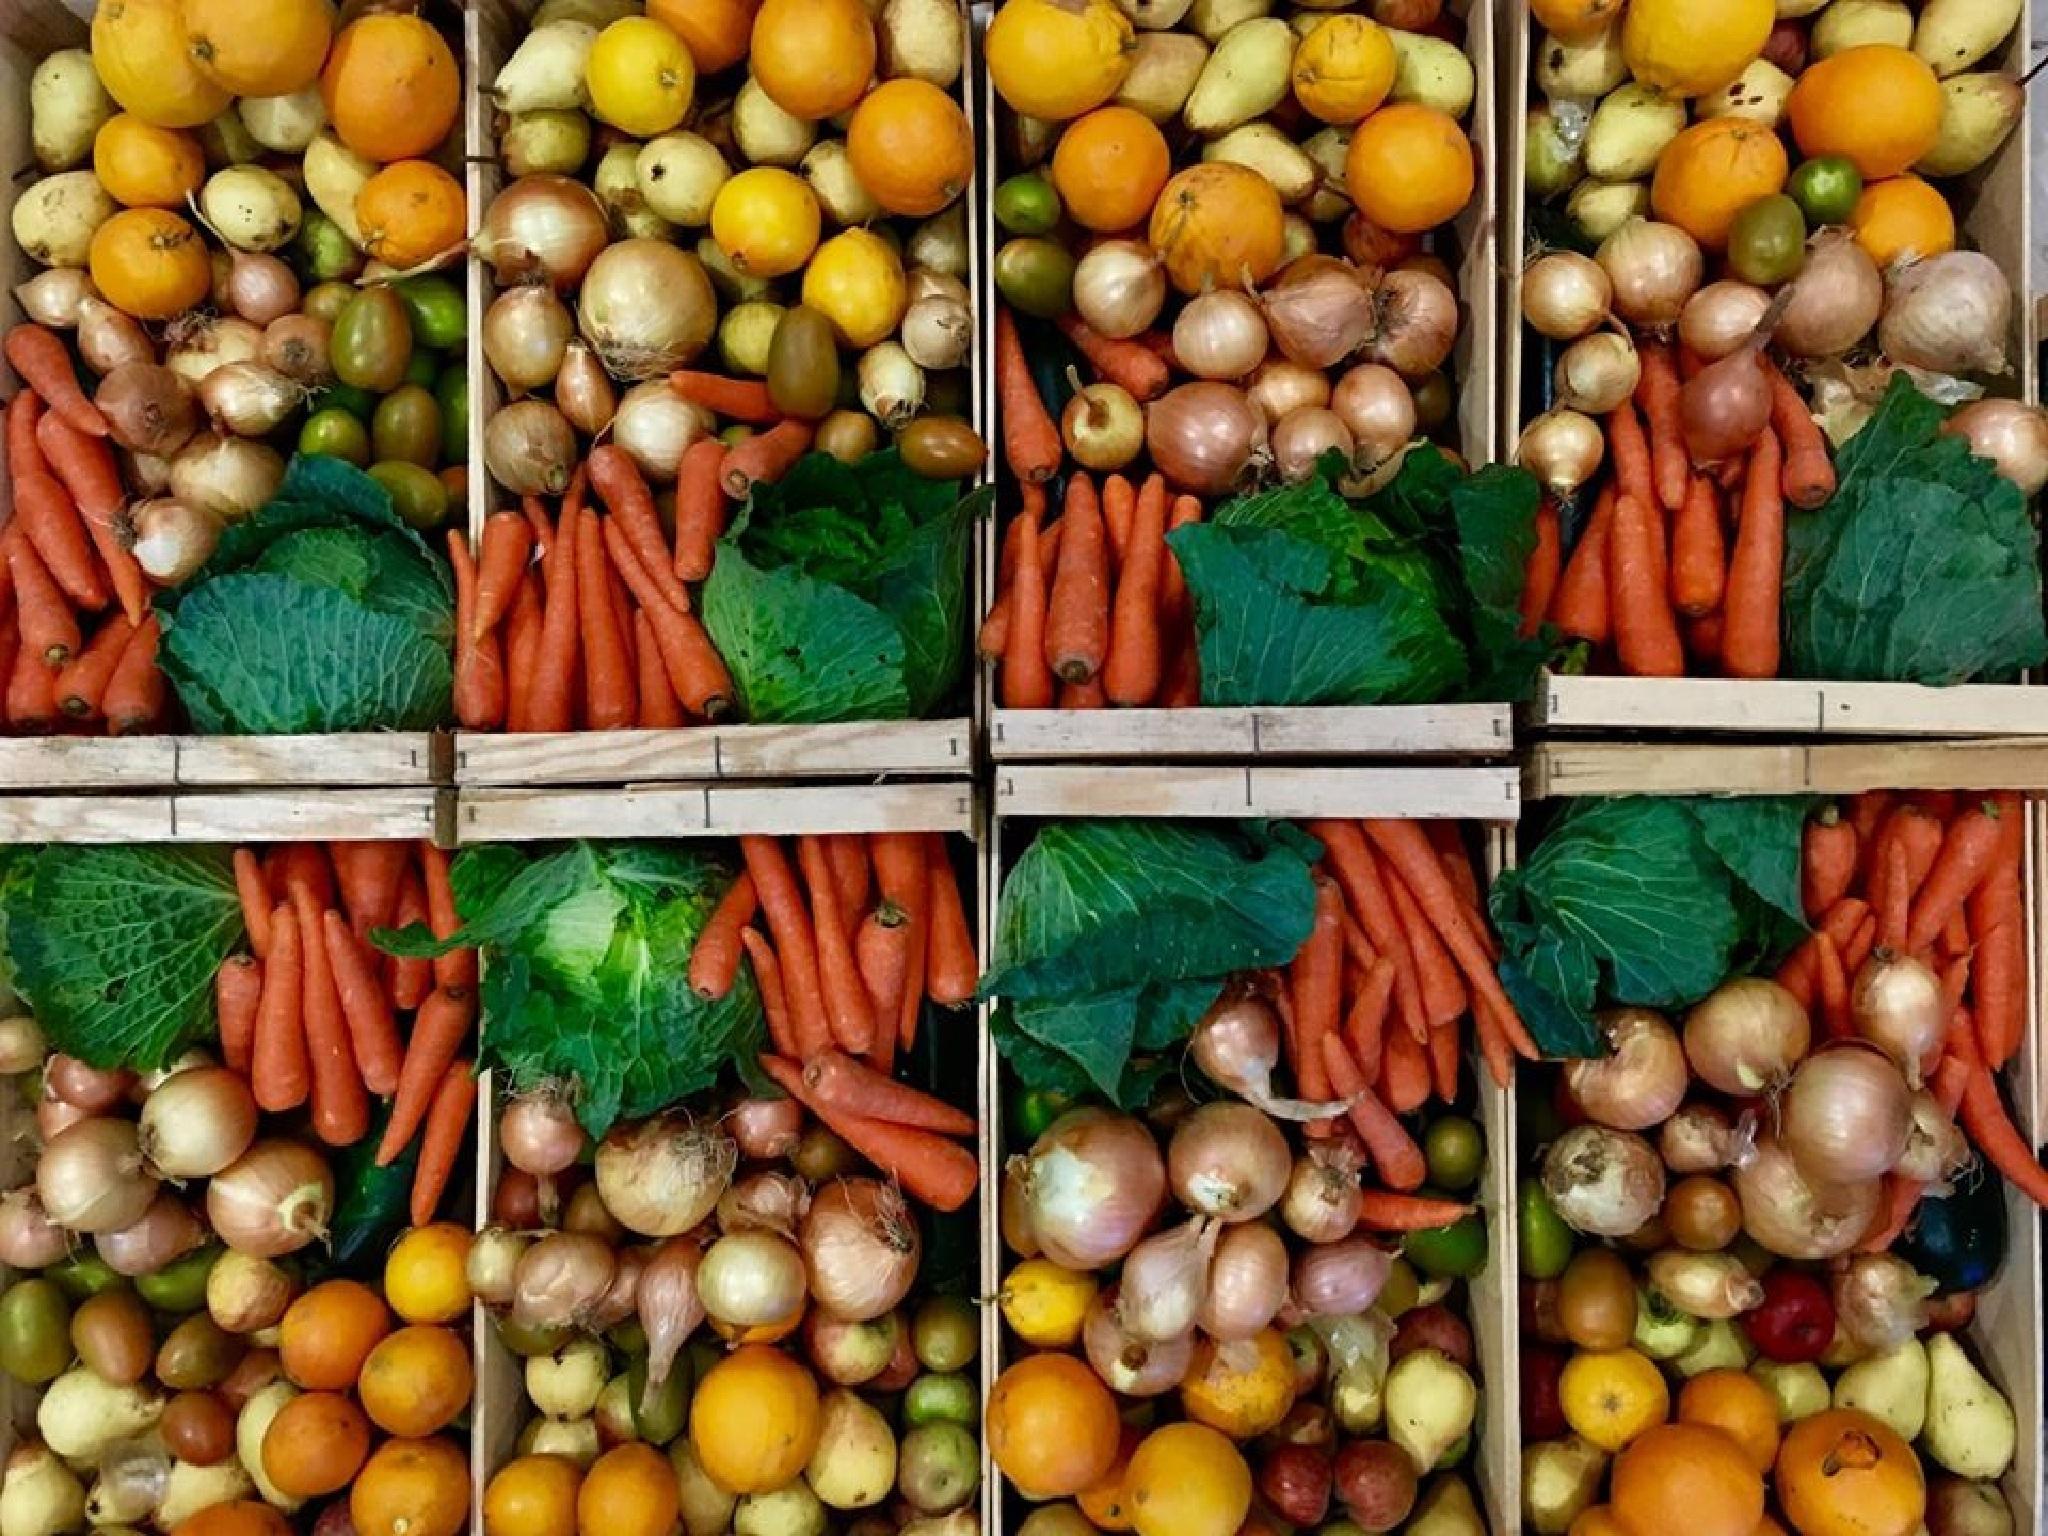 Projectos Sustentáveis, Fruta Feia